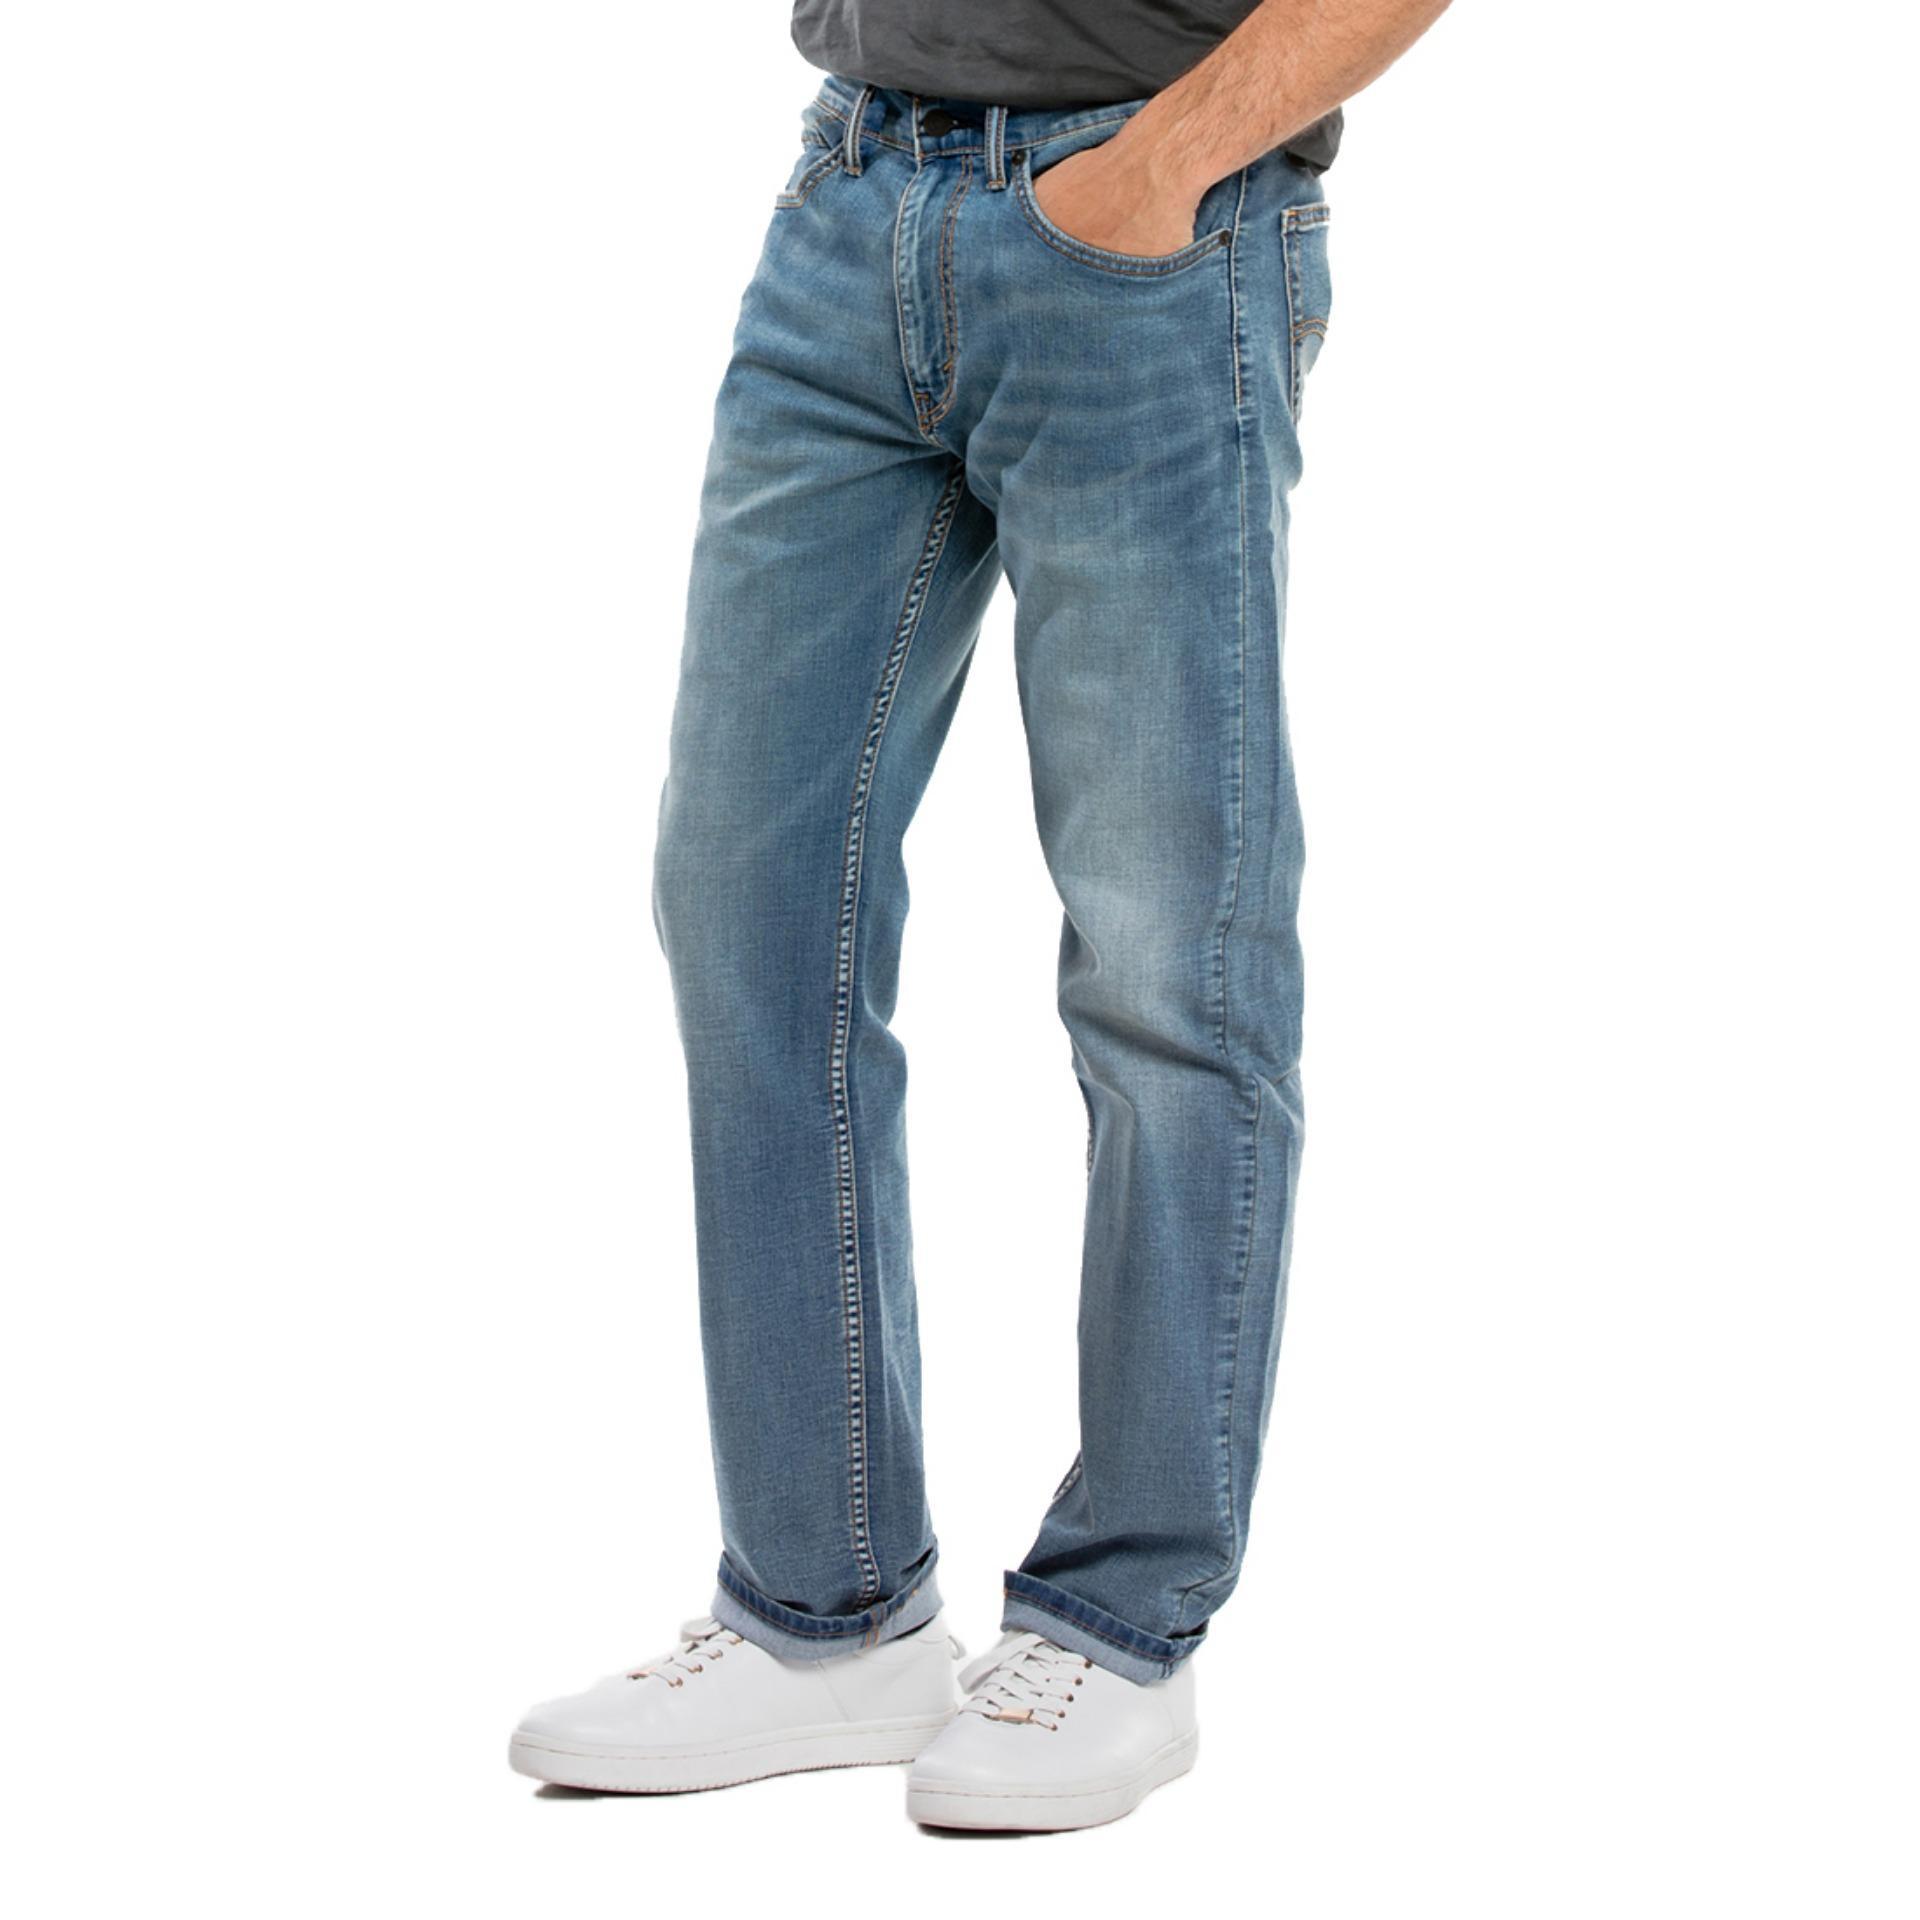 Levis Performance Cool 505 Regular Fit Jeans - Vanilla Cool Blue RAYA LVSBDAY